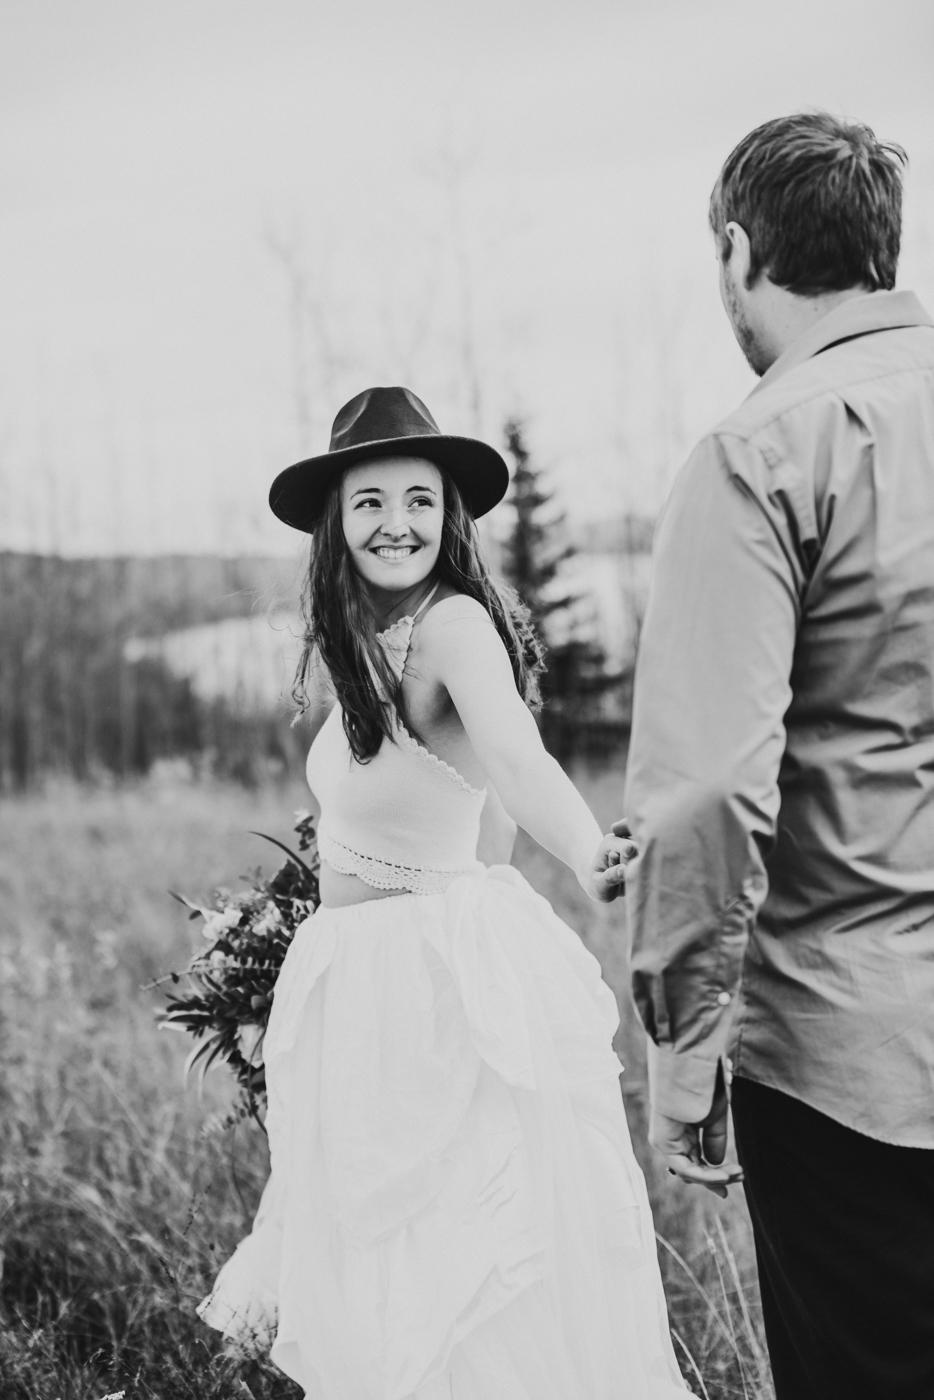 FortSt.John_photographer_TyraEPhotography_Wedding_Couple_Family_Photograhy_DawsonCreek_Elopement_Bride_Boduoir_Portraits-33.jpg